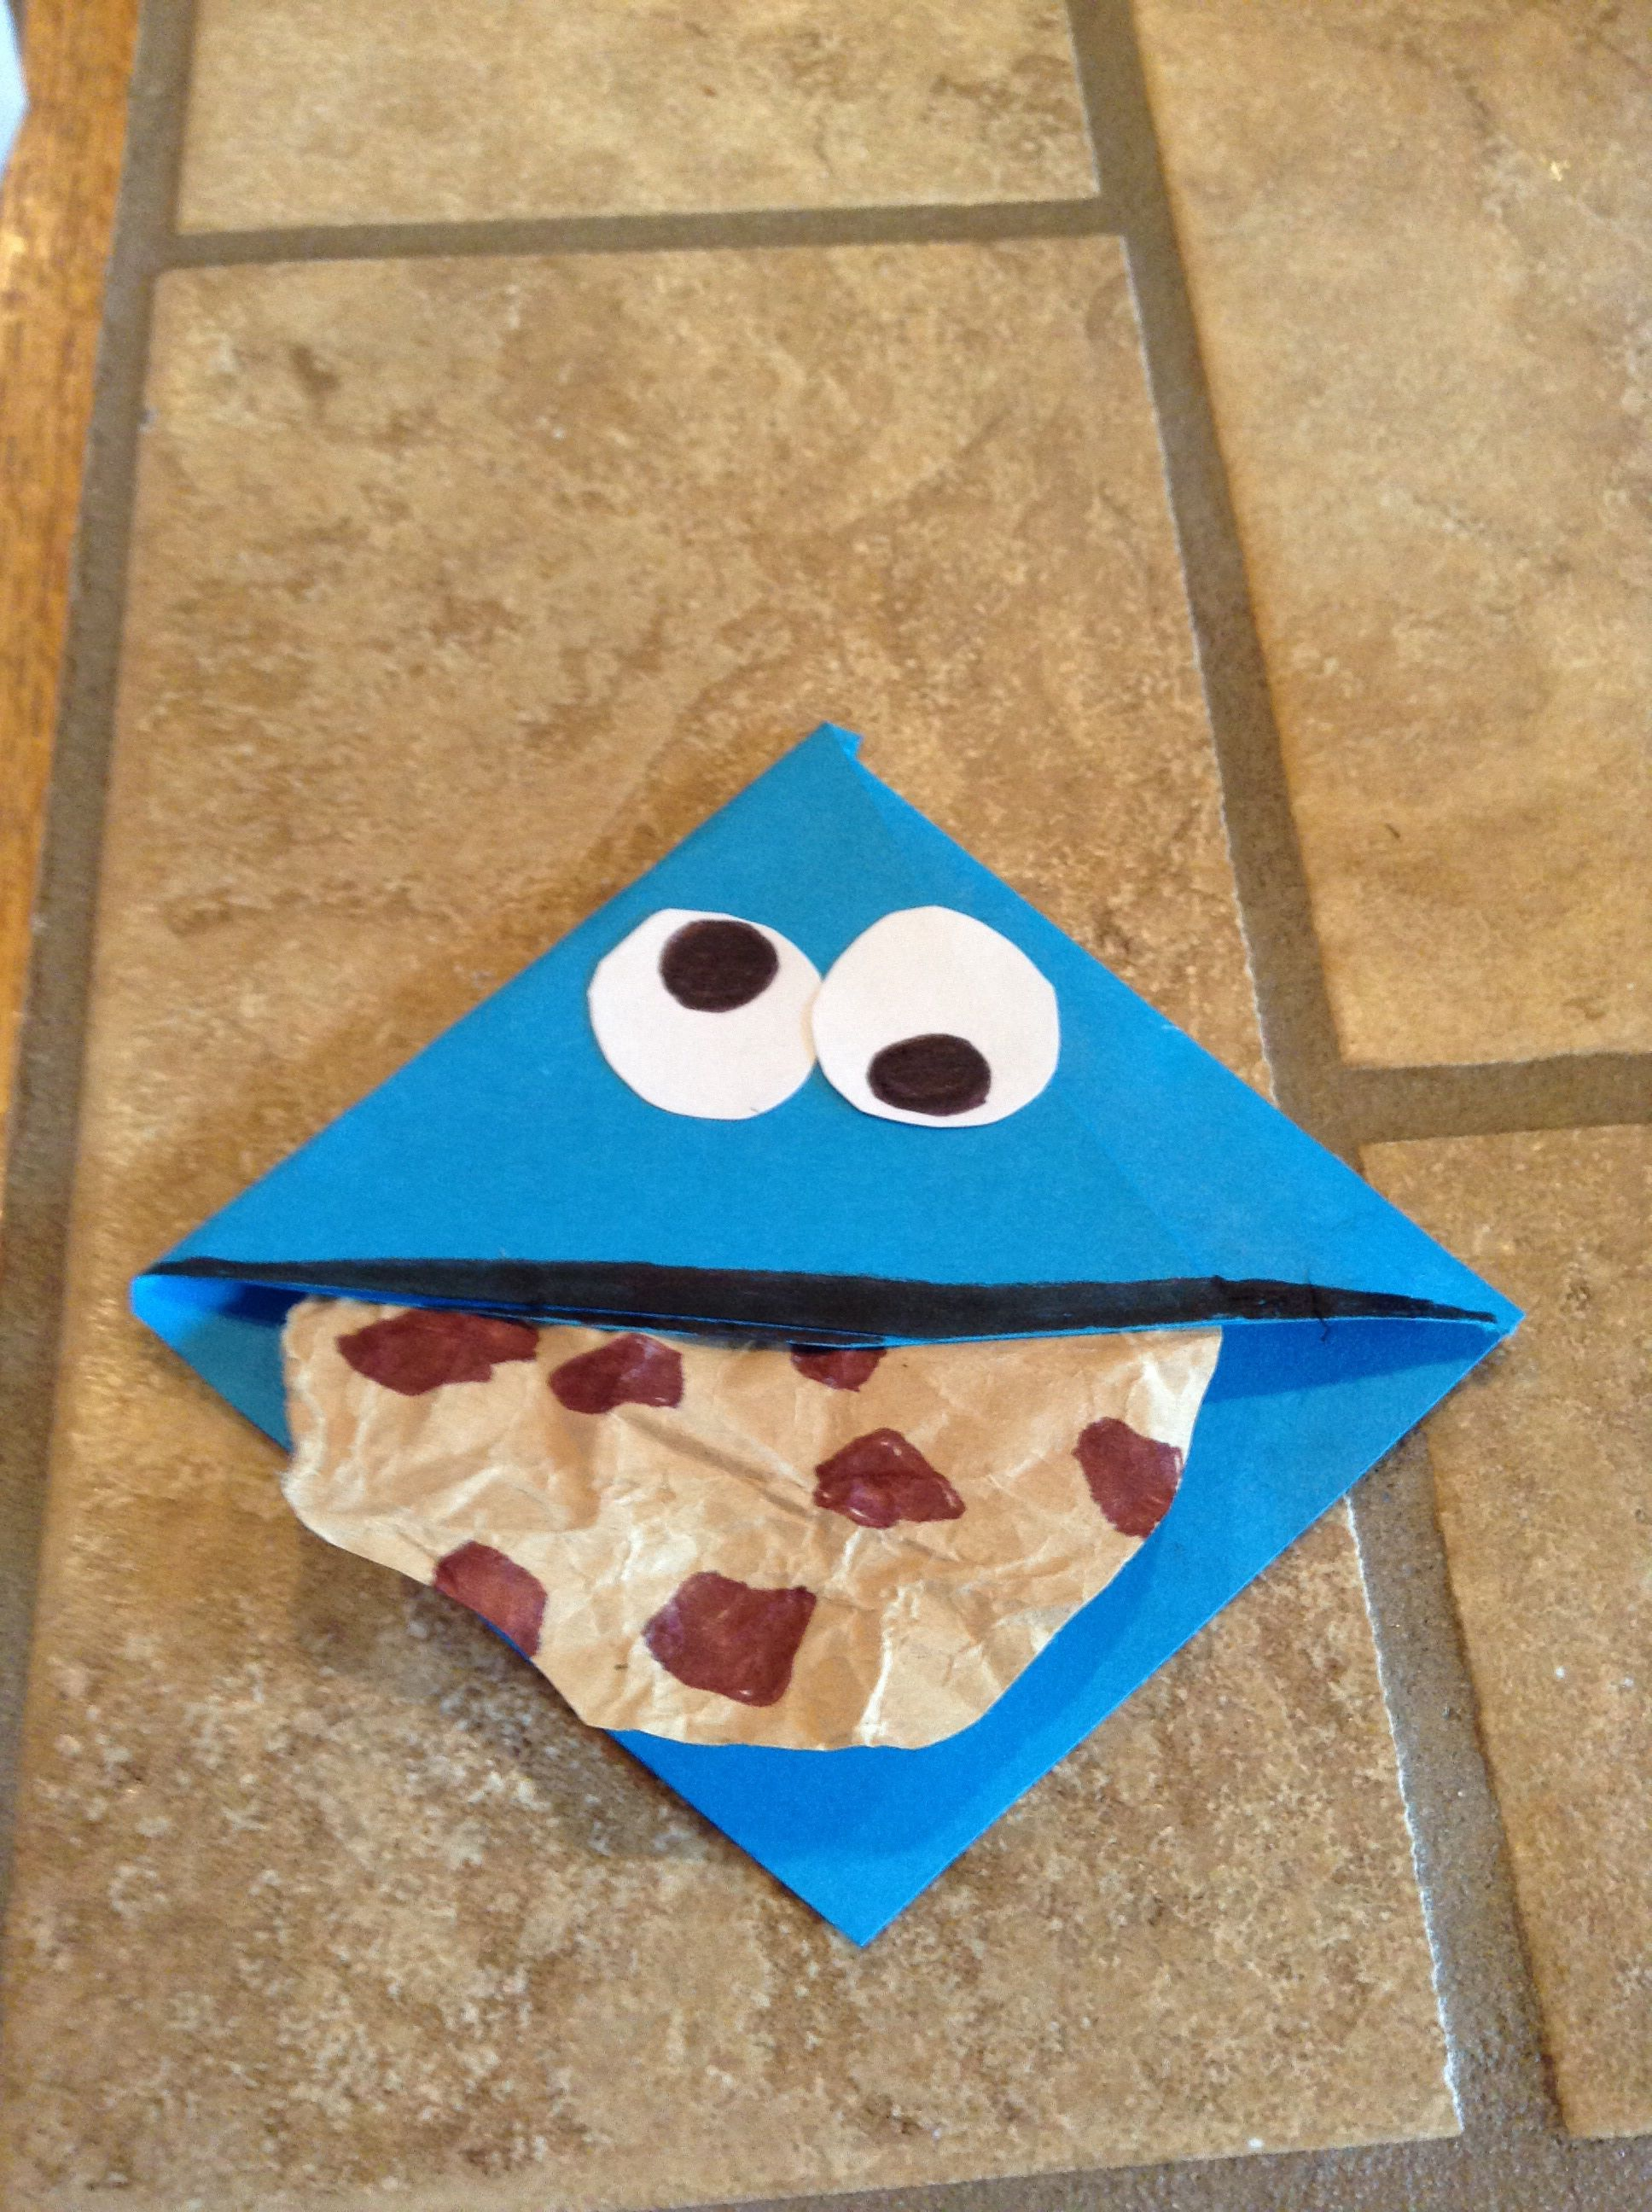 Cookie Monster Bookmark!!! (Made myself)